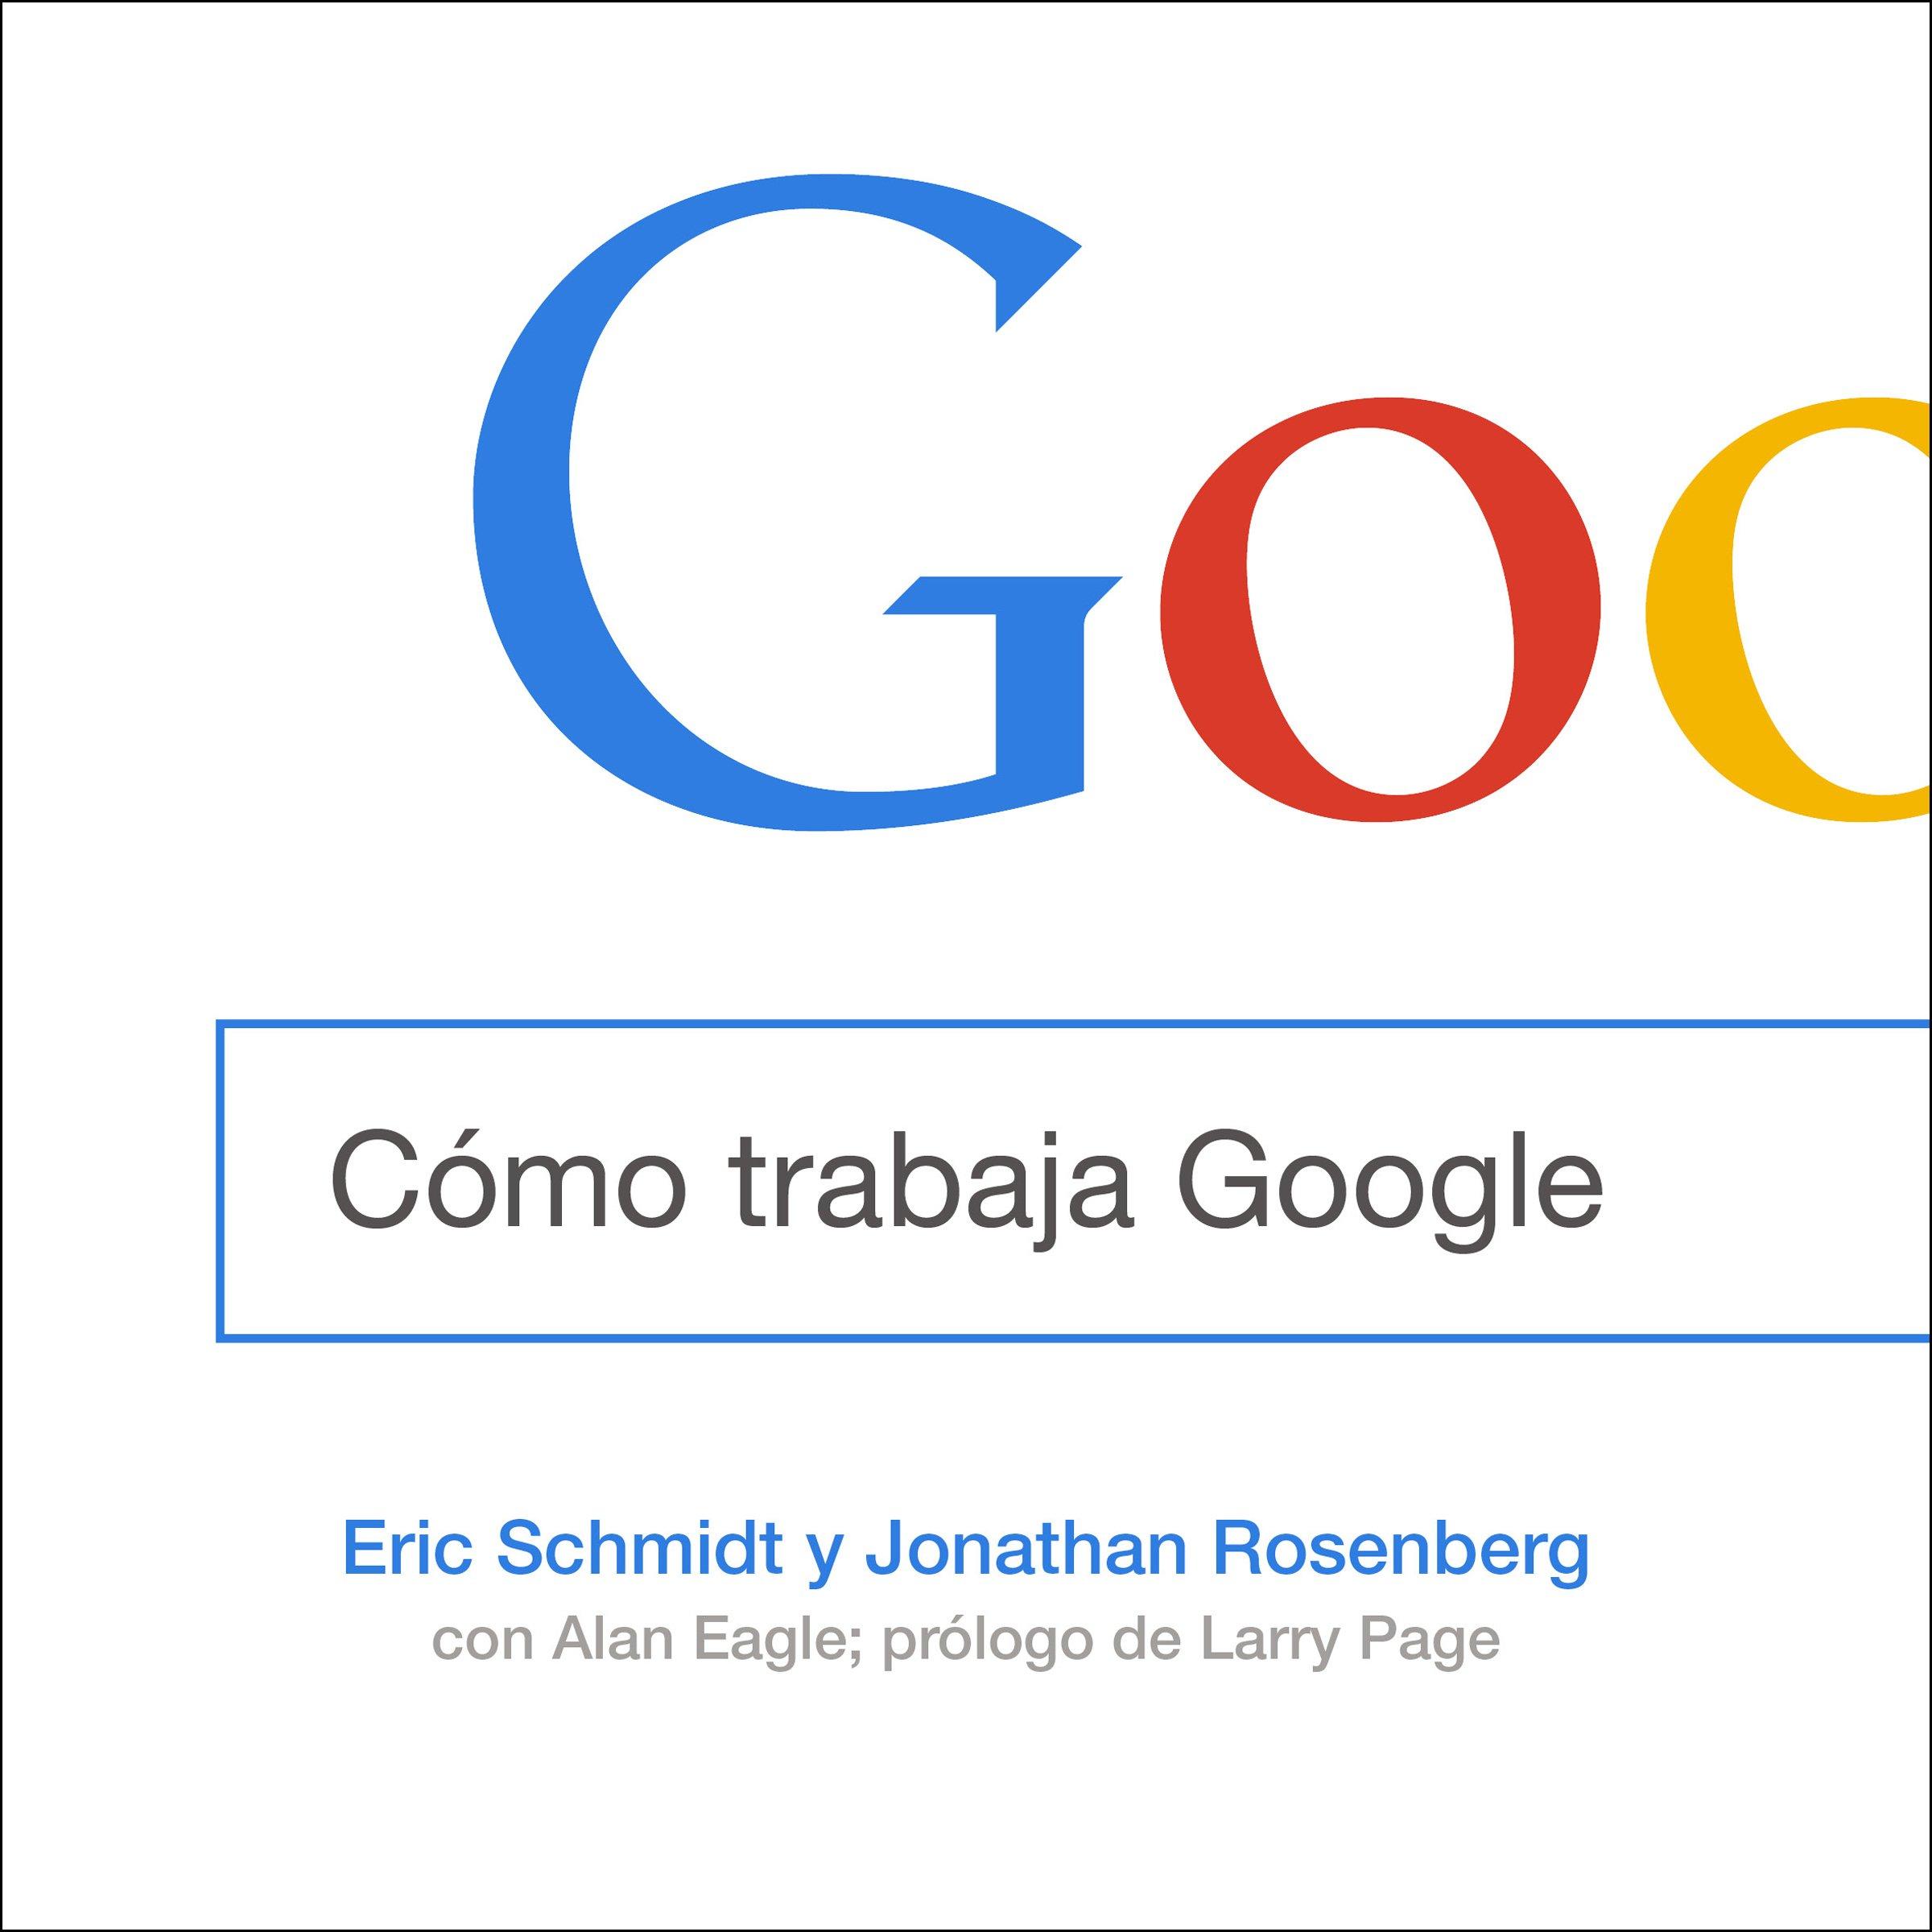 Cómo trabaja Google [How Google Works]